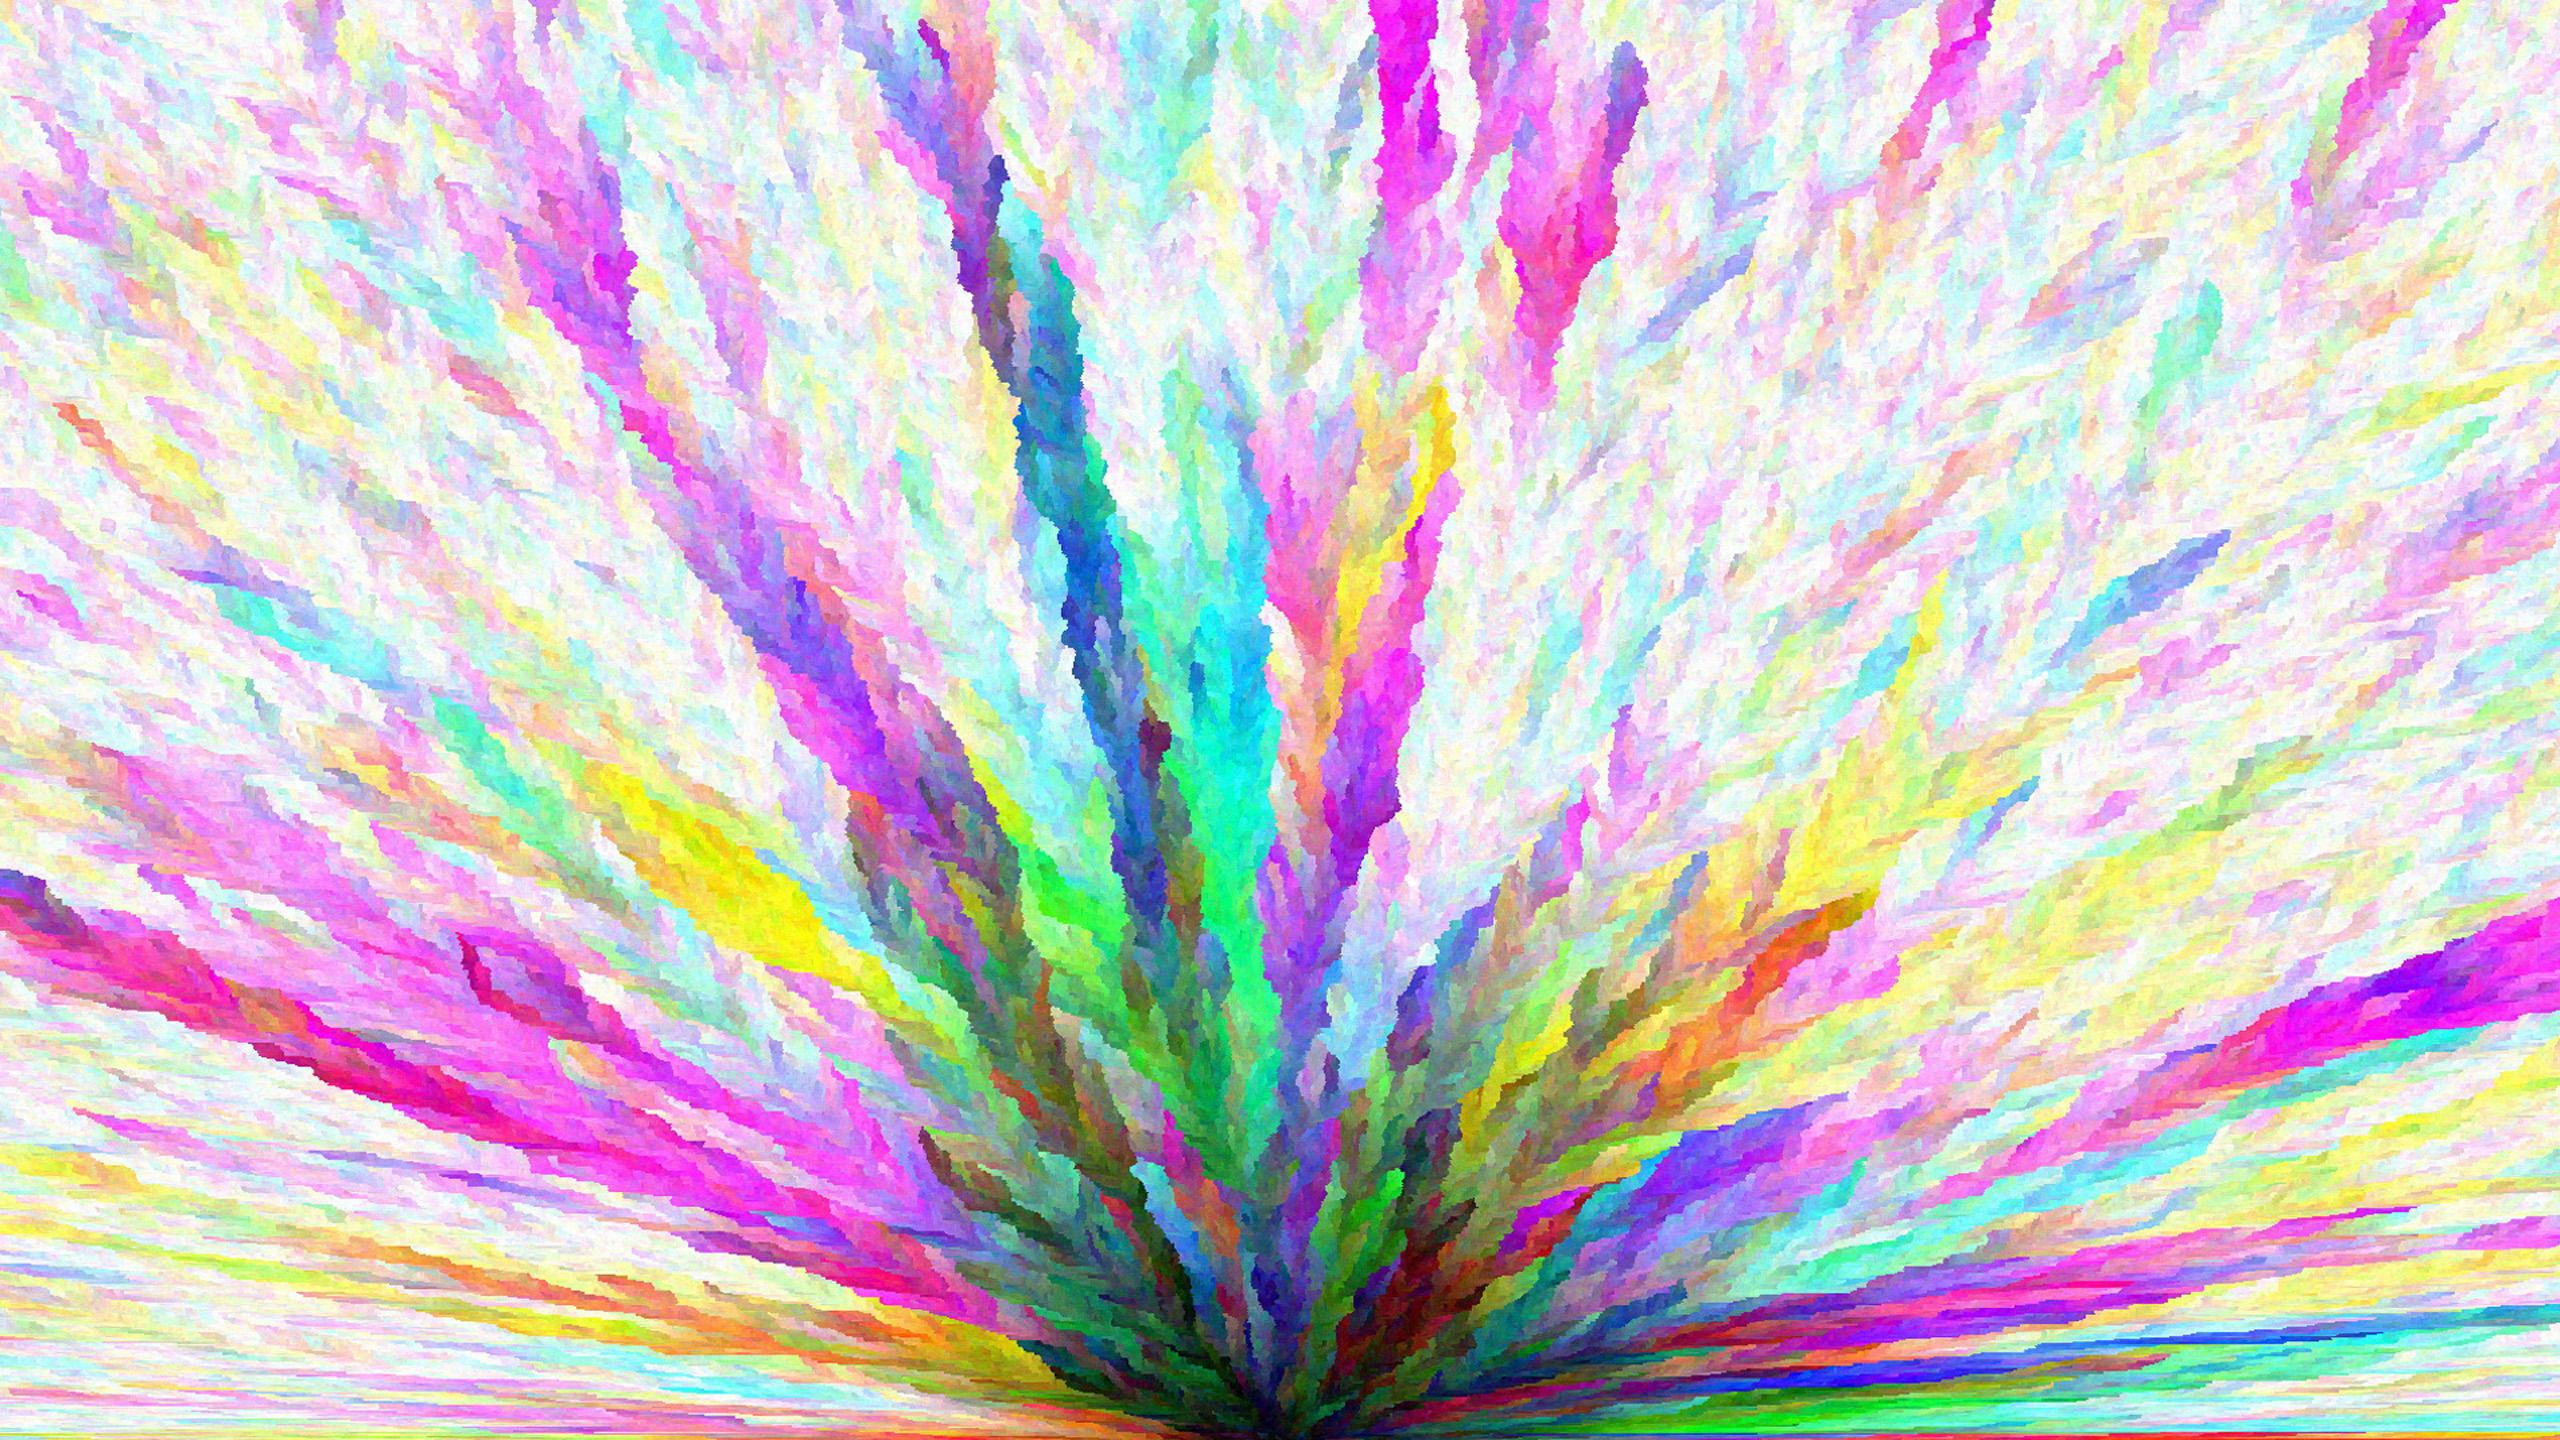 Mac 3d Wallpapers Free Download Solid Color Backgrounds Pixelstalk Net